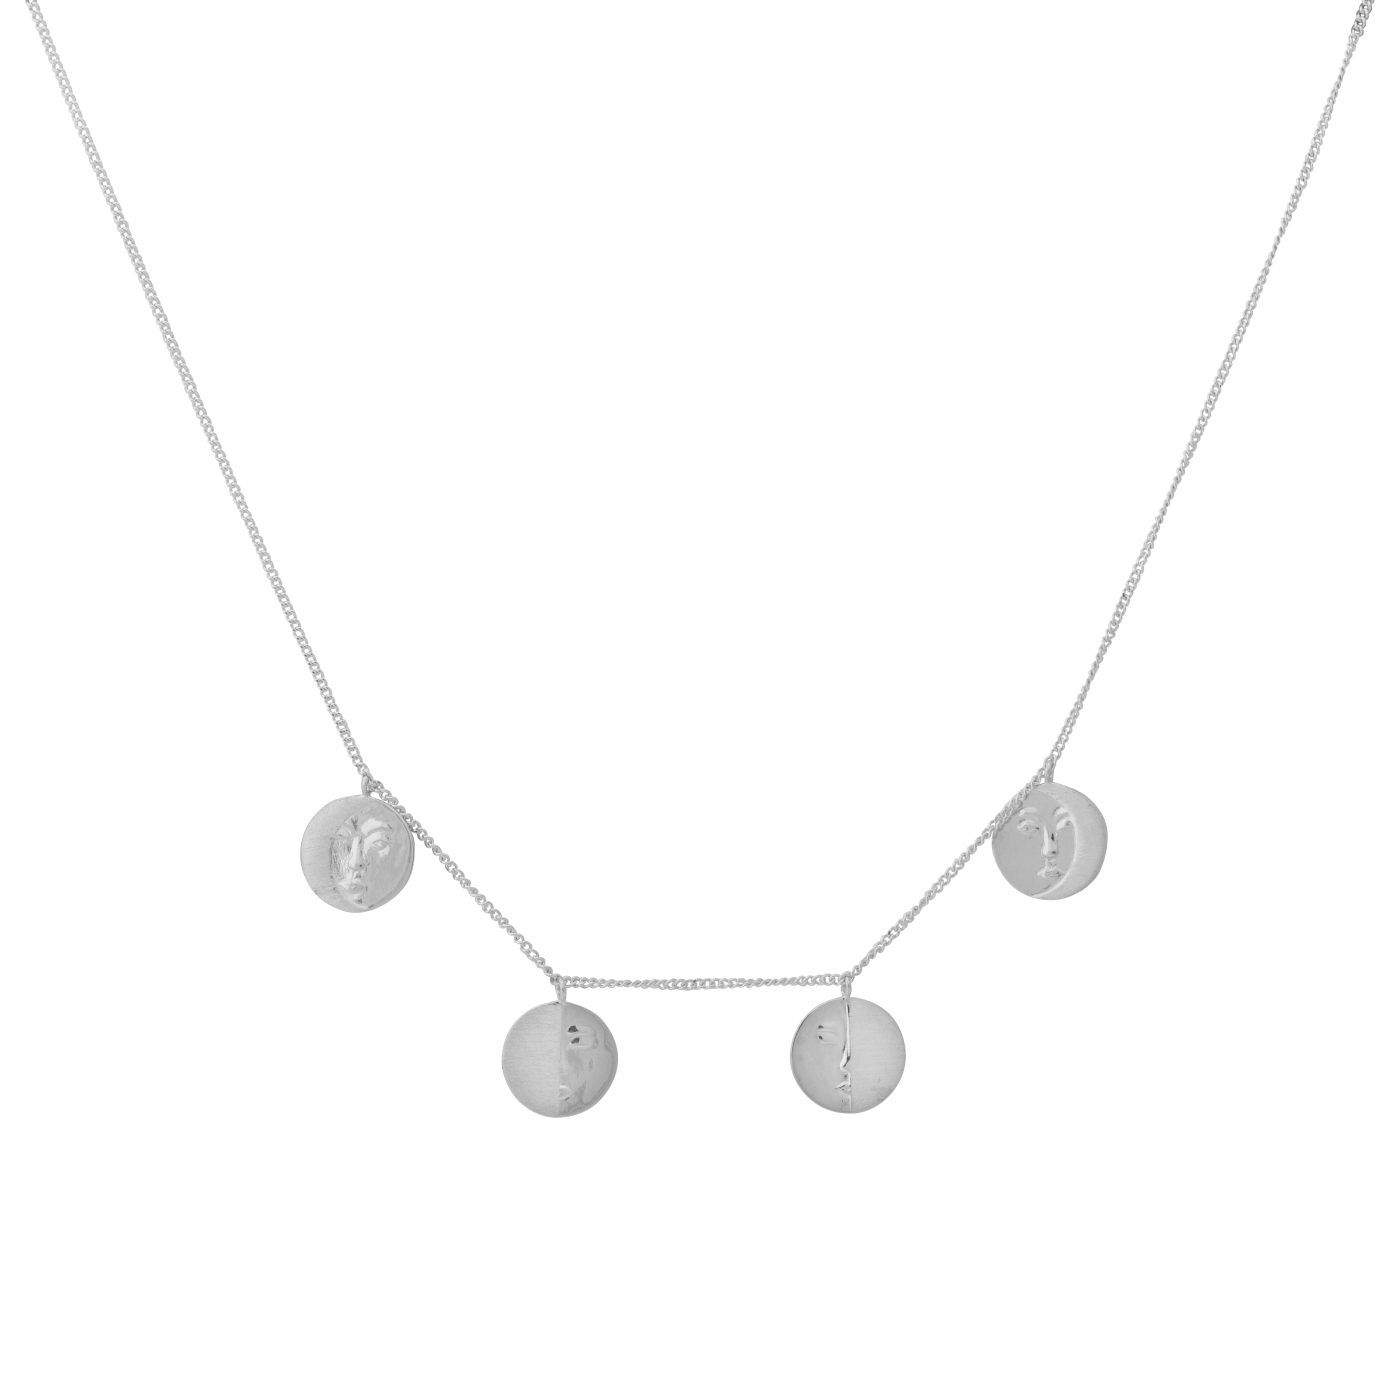 ANNA + NINA 925 Sterling Zilveren Essentials Lunar Ketting 18-2M903005S (Lengte: 42.00 cm)